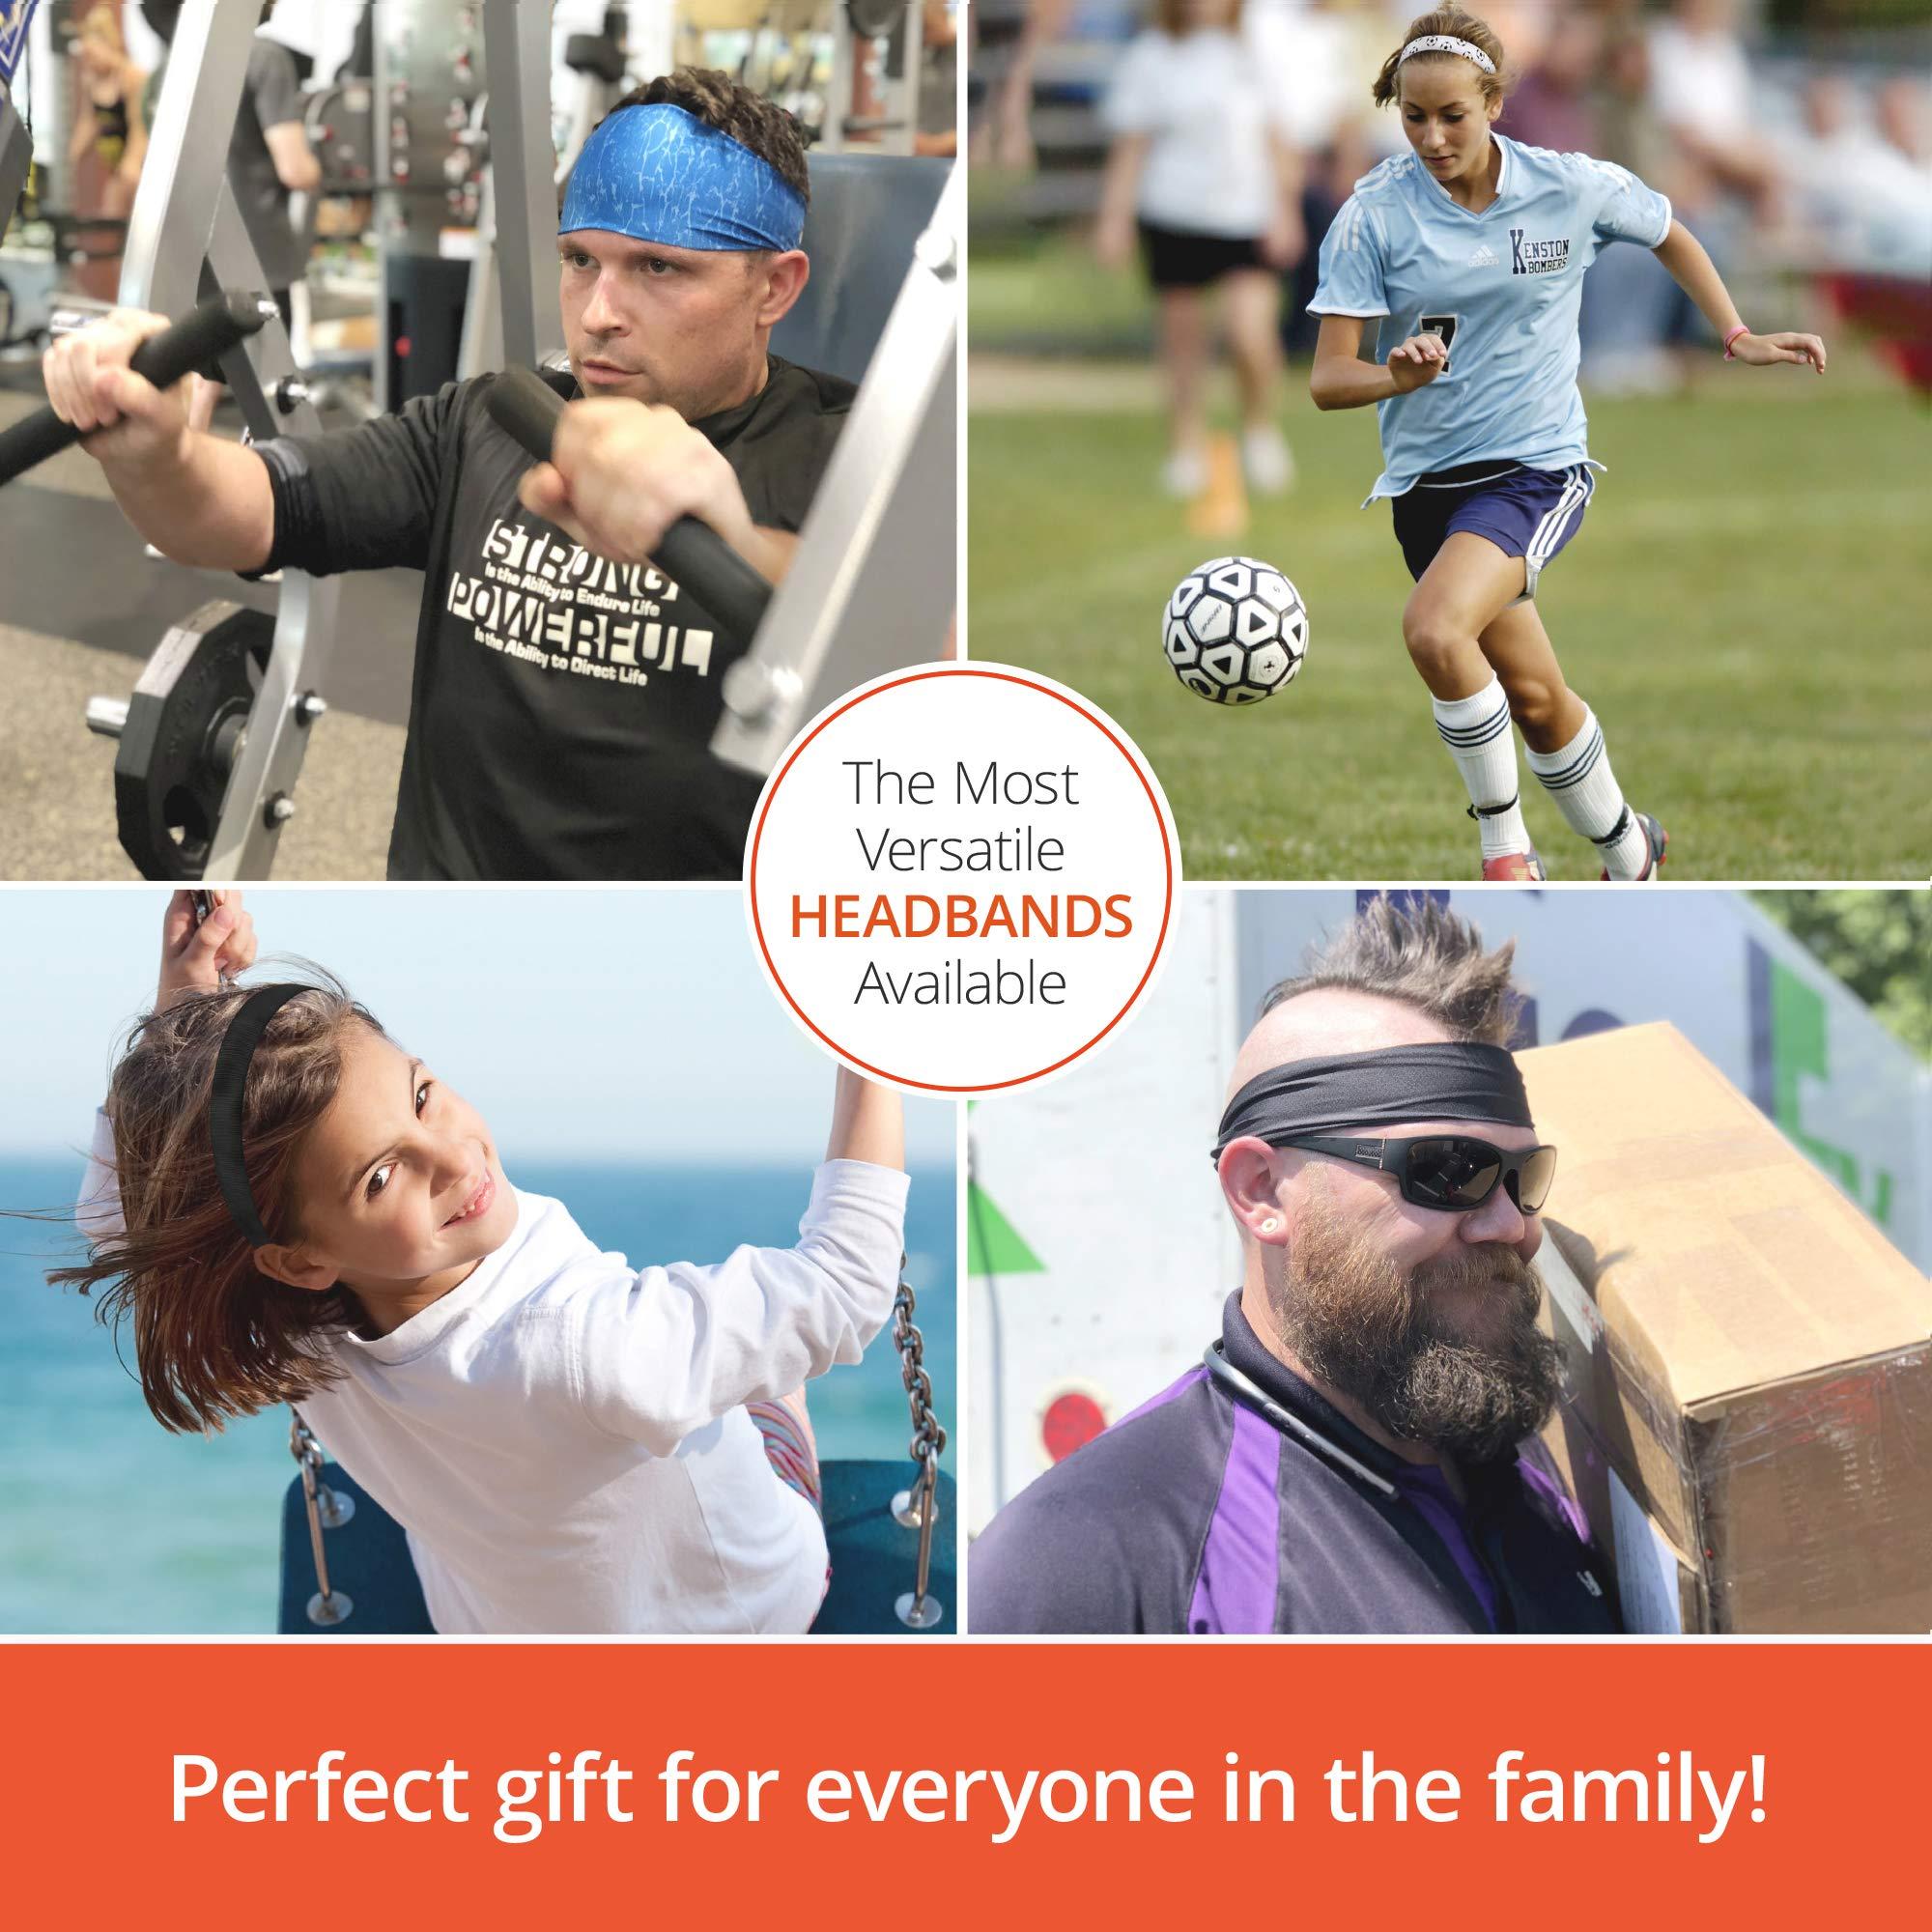 Cooling Headbands Moisture Wicking Womens Sweatband & Sports Headband | Workouts Cardio Running Yoga (Construction Orange) by Bani Bands (Image #7)